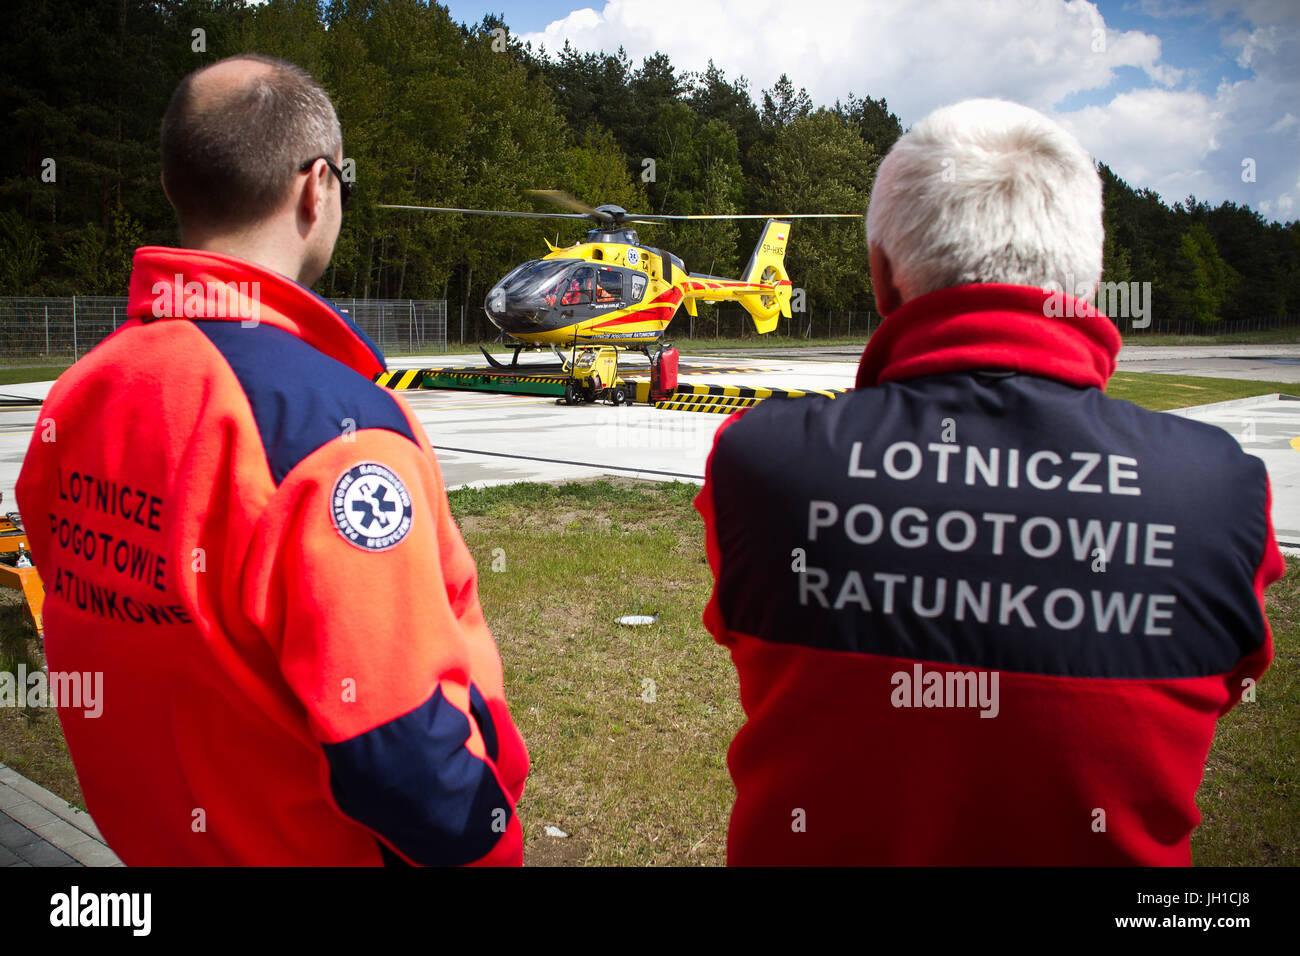 Polish Helicopter Emergency Medical Service (HEMS) Eurocopter 135 at Polsih HEMS base in Gdansk, Poland. Stock Photo